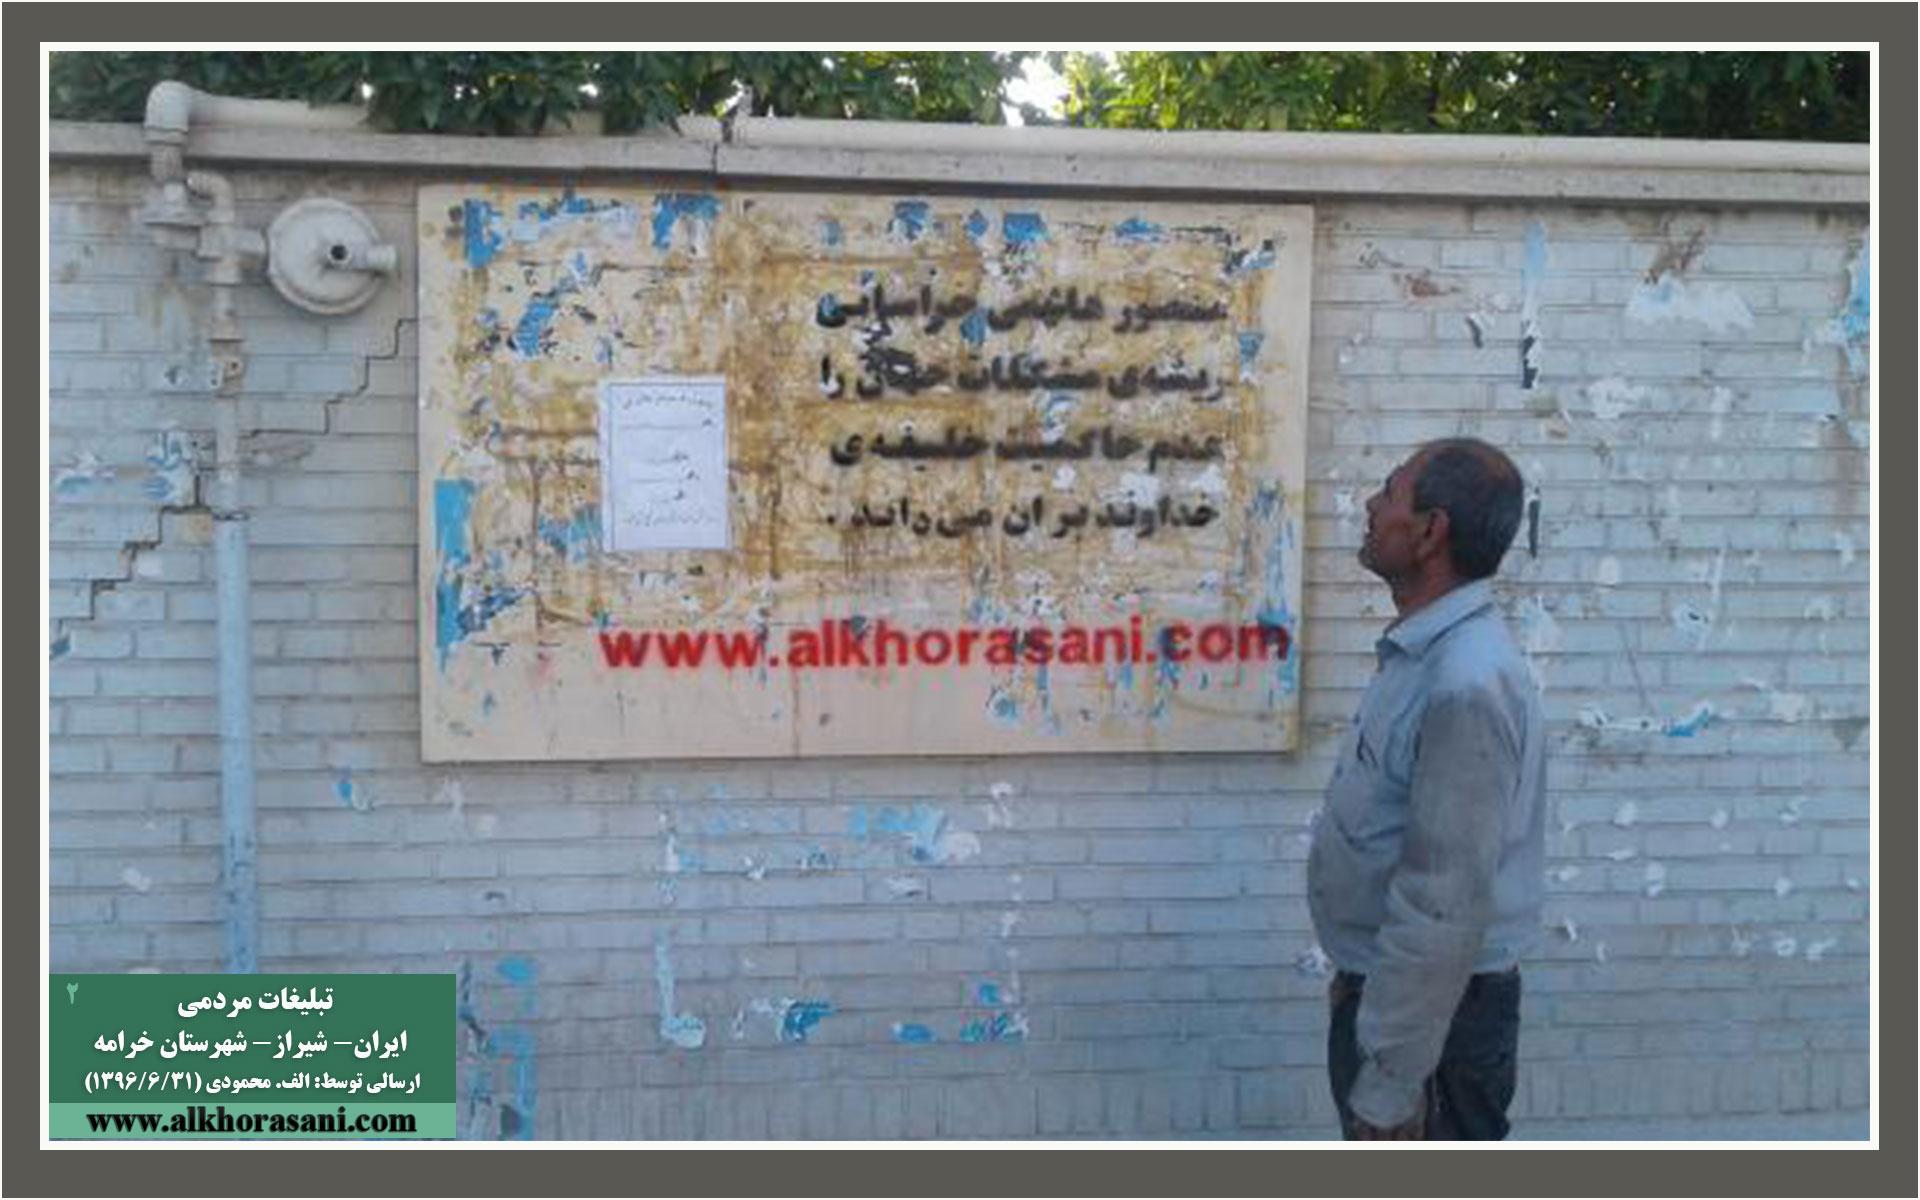 زمینه سازی ظهور؛ شیراز